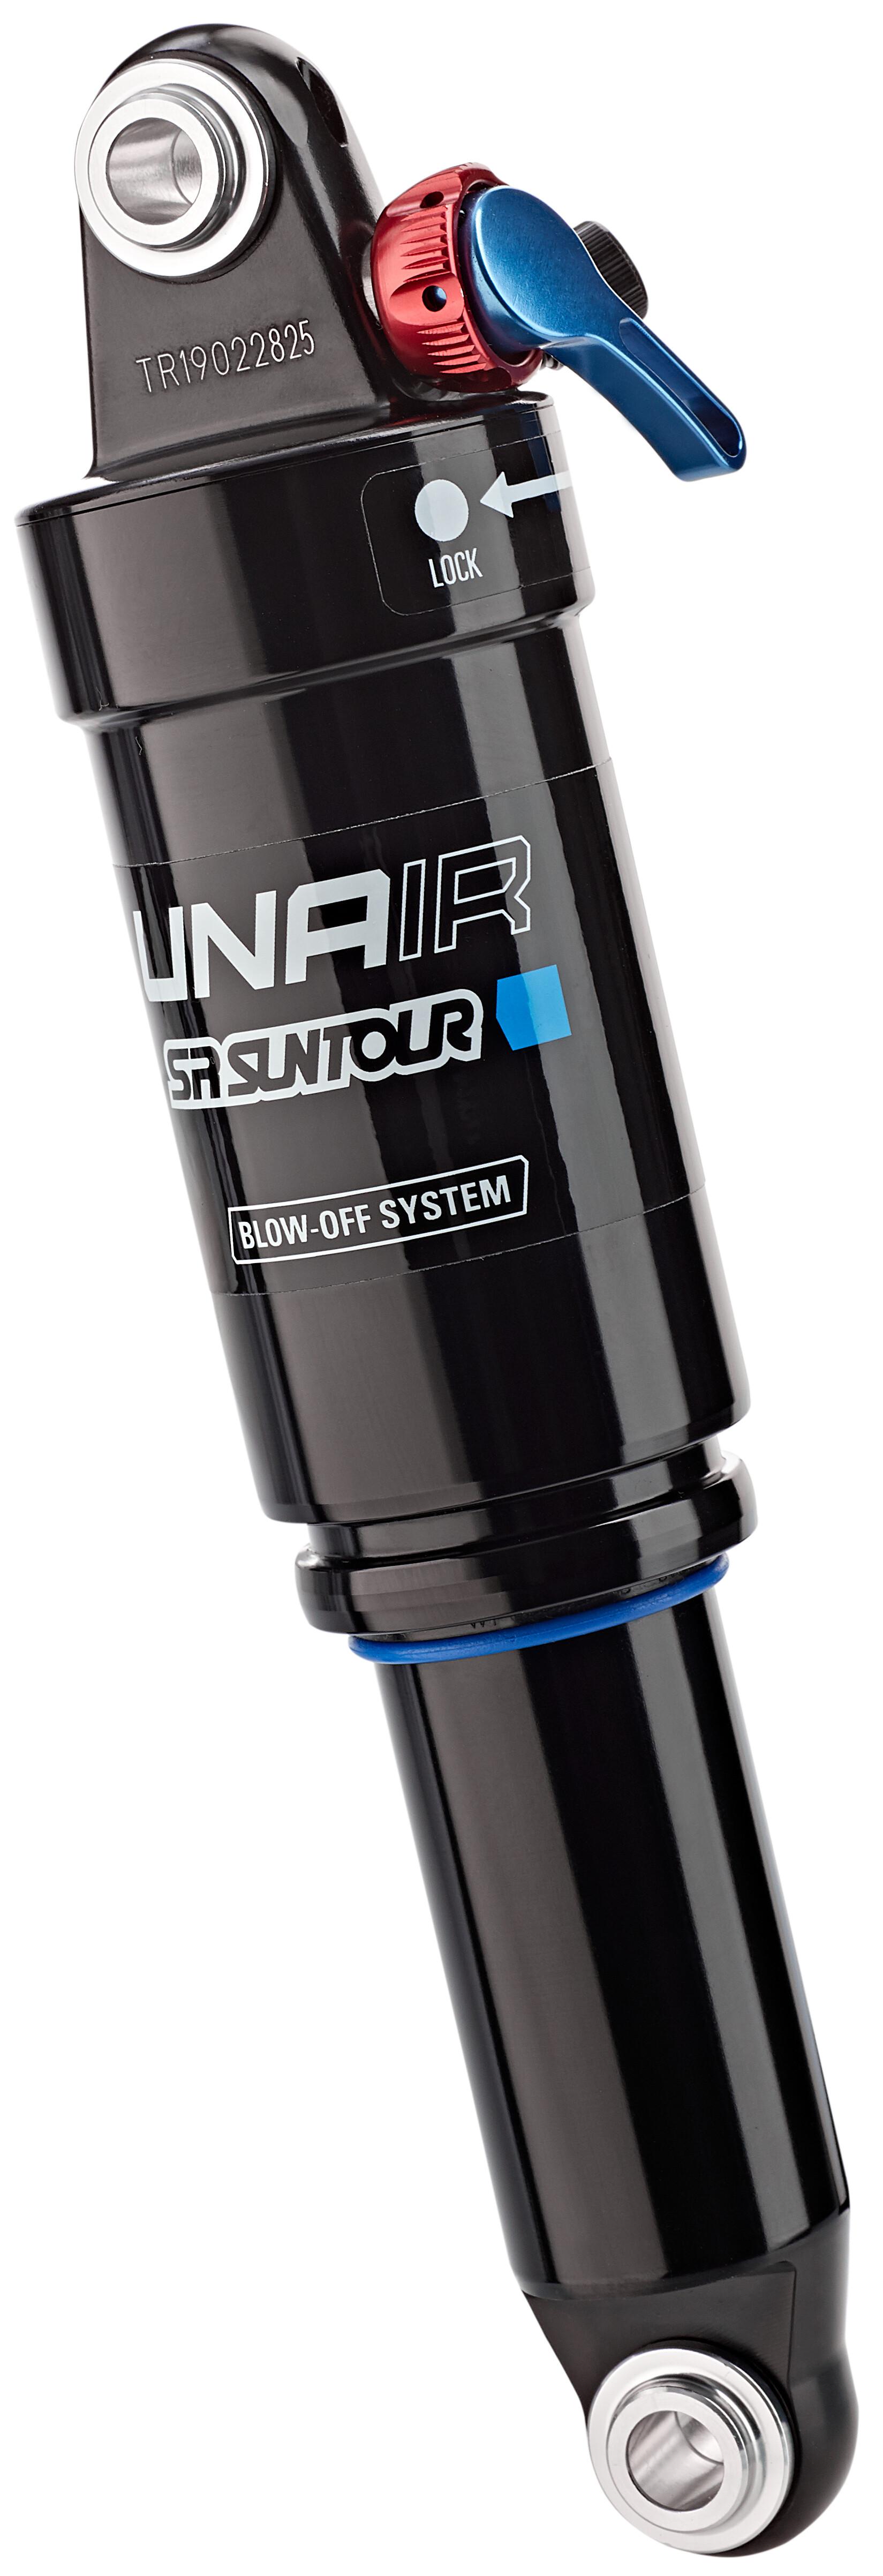 Details about  /Suntour UNAIR LO R Rear Bike Air Shock for MTB Bikes